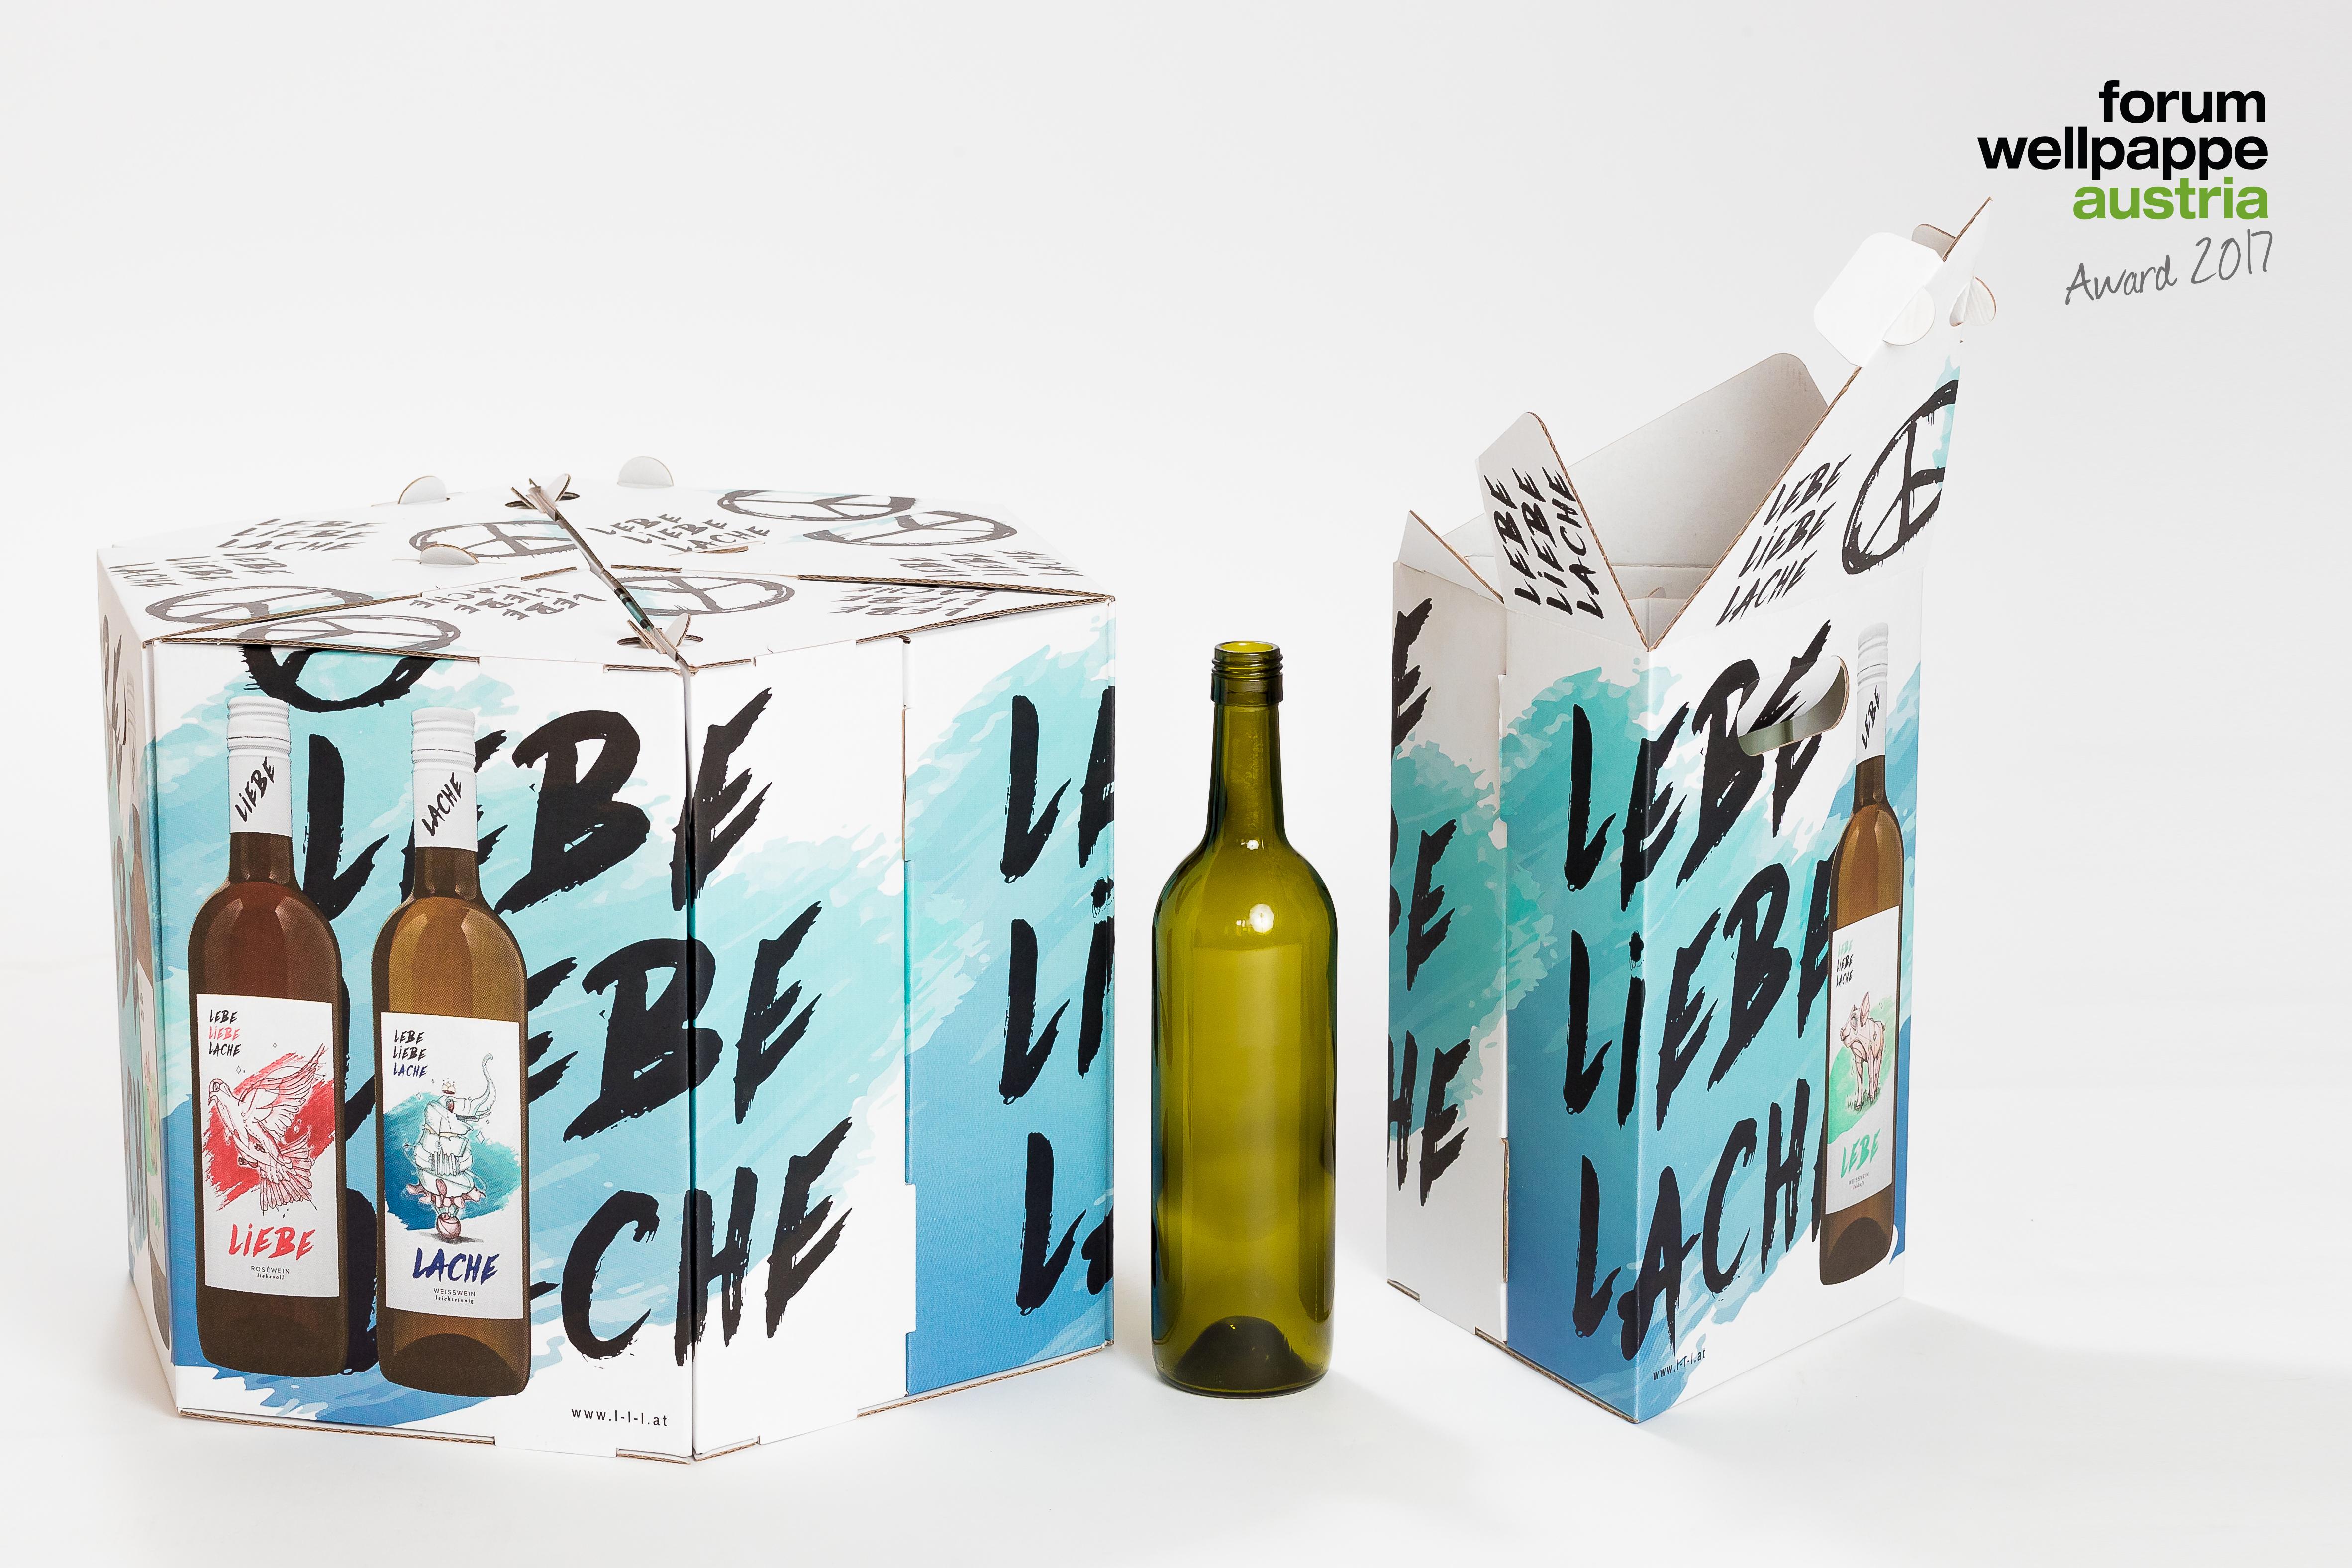 Wellpappe Award 2017 Gewinner Kreativ DS Smith Packaging South East © L. Schedl